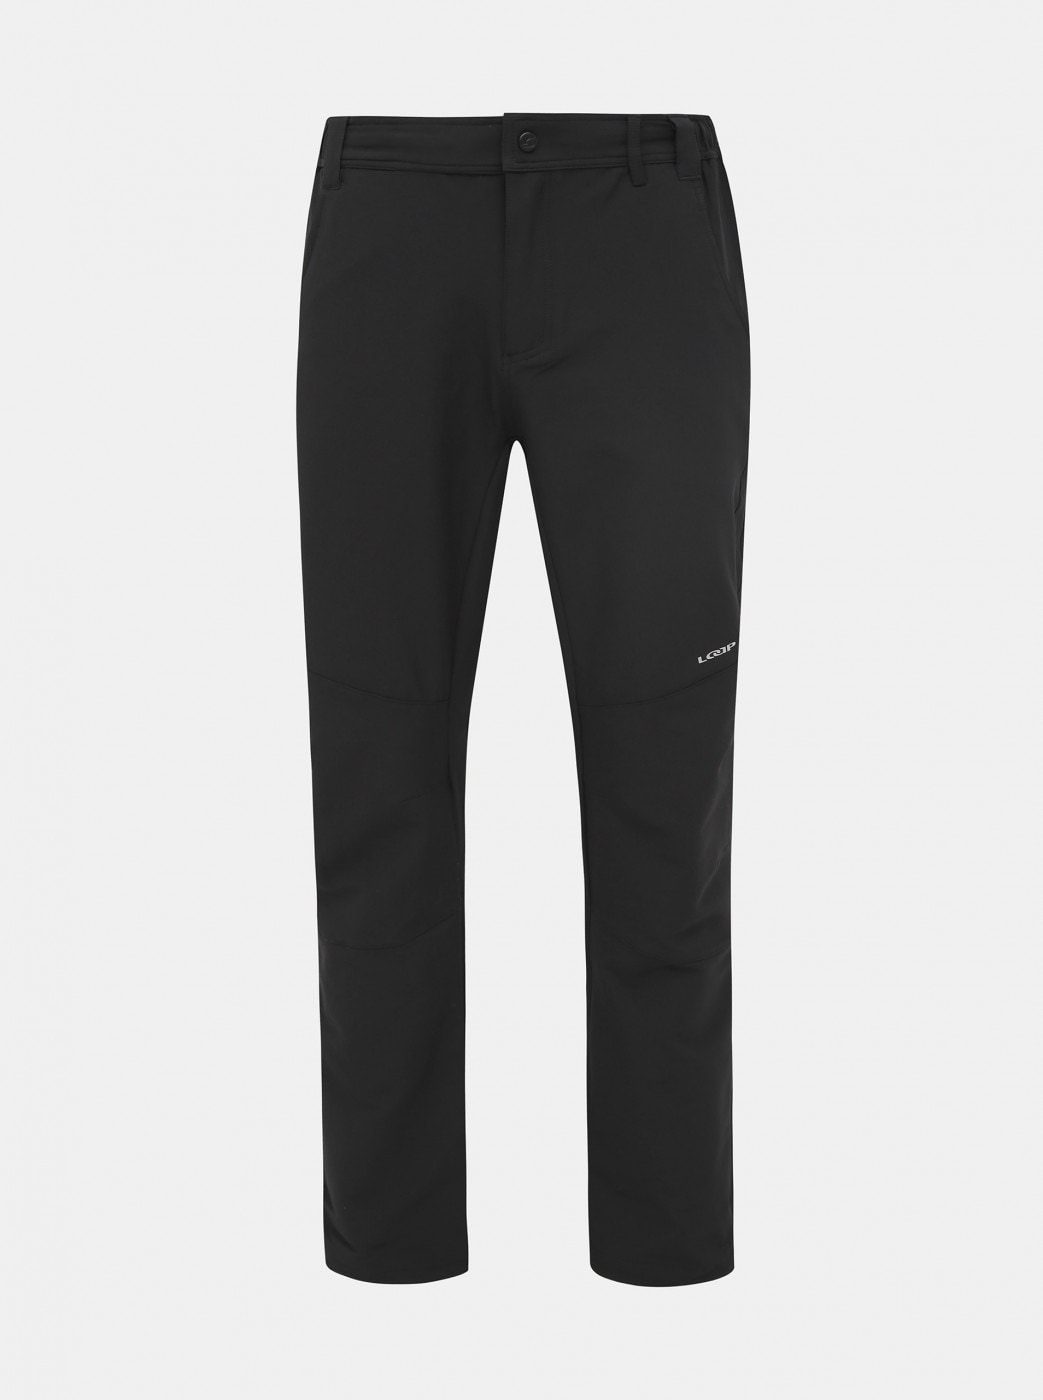 Loap Ulfo Men's Softshell Functional Pants